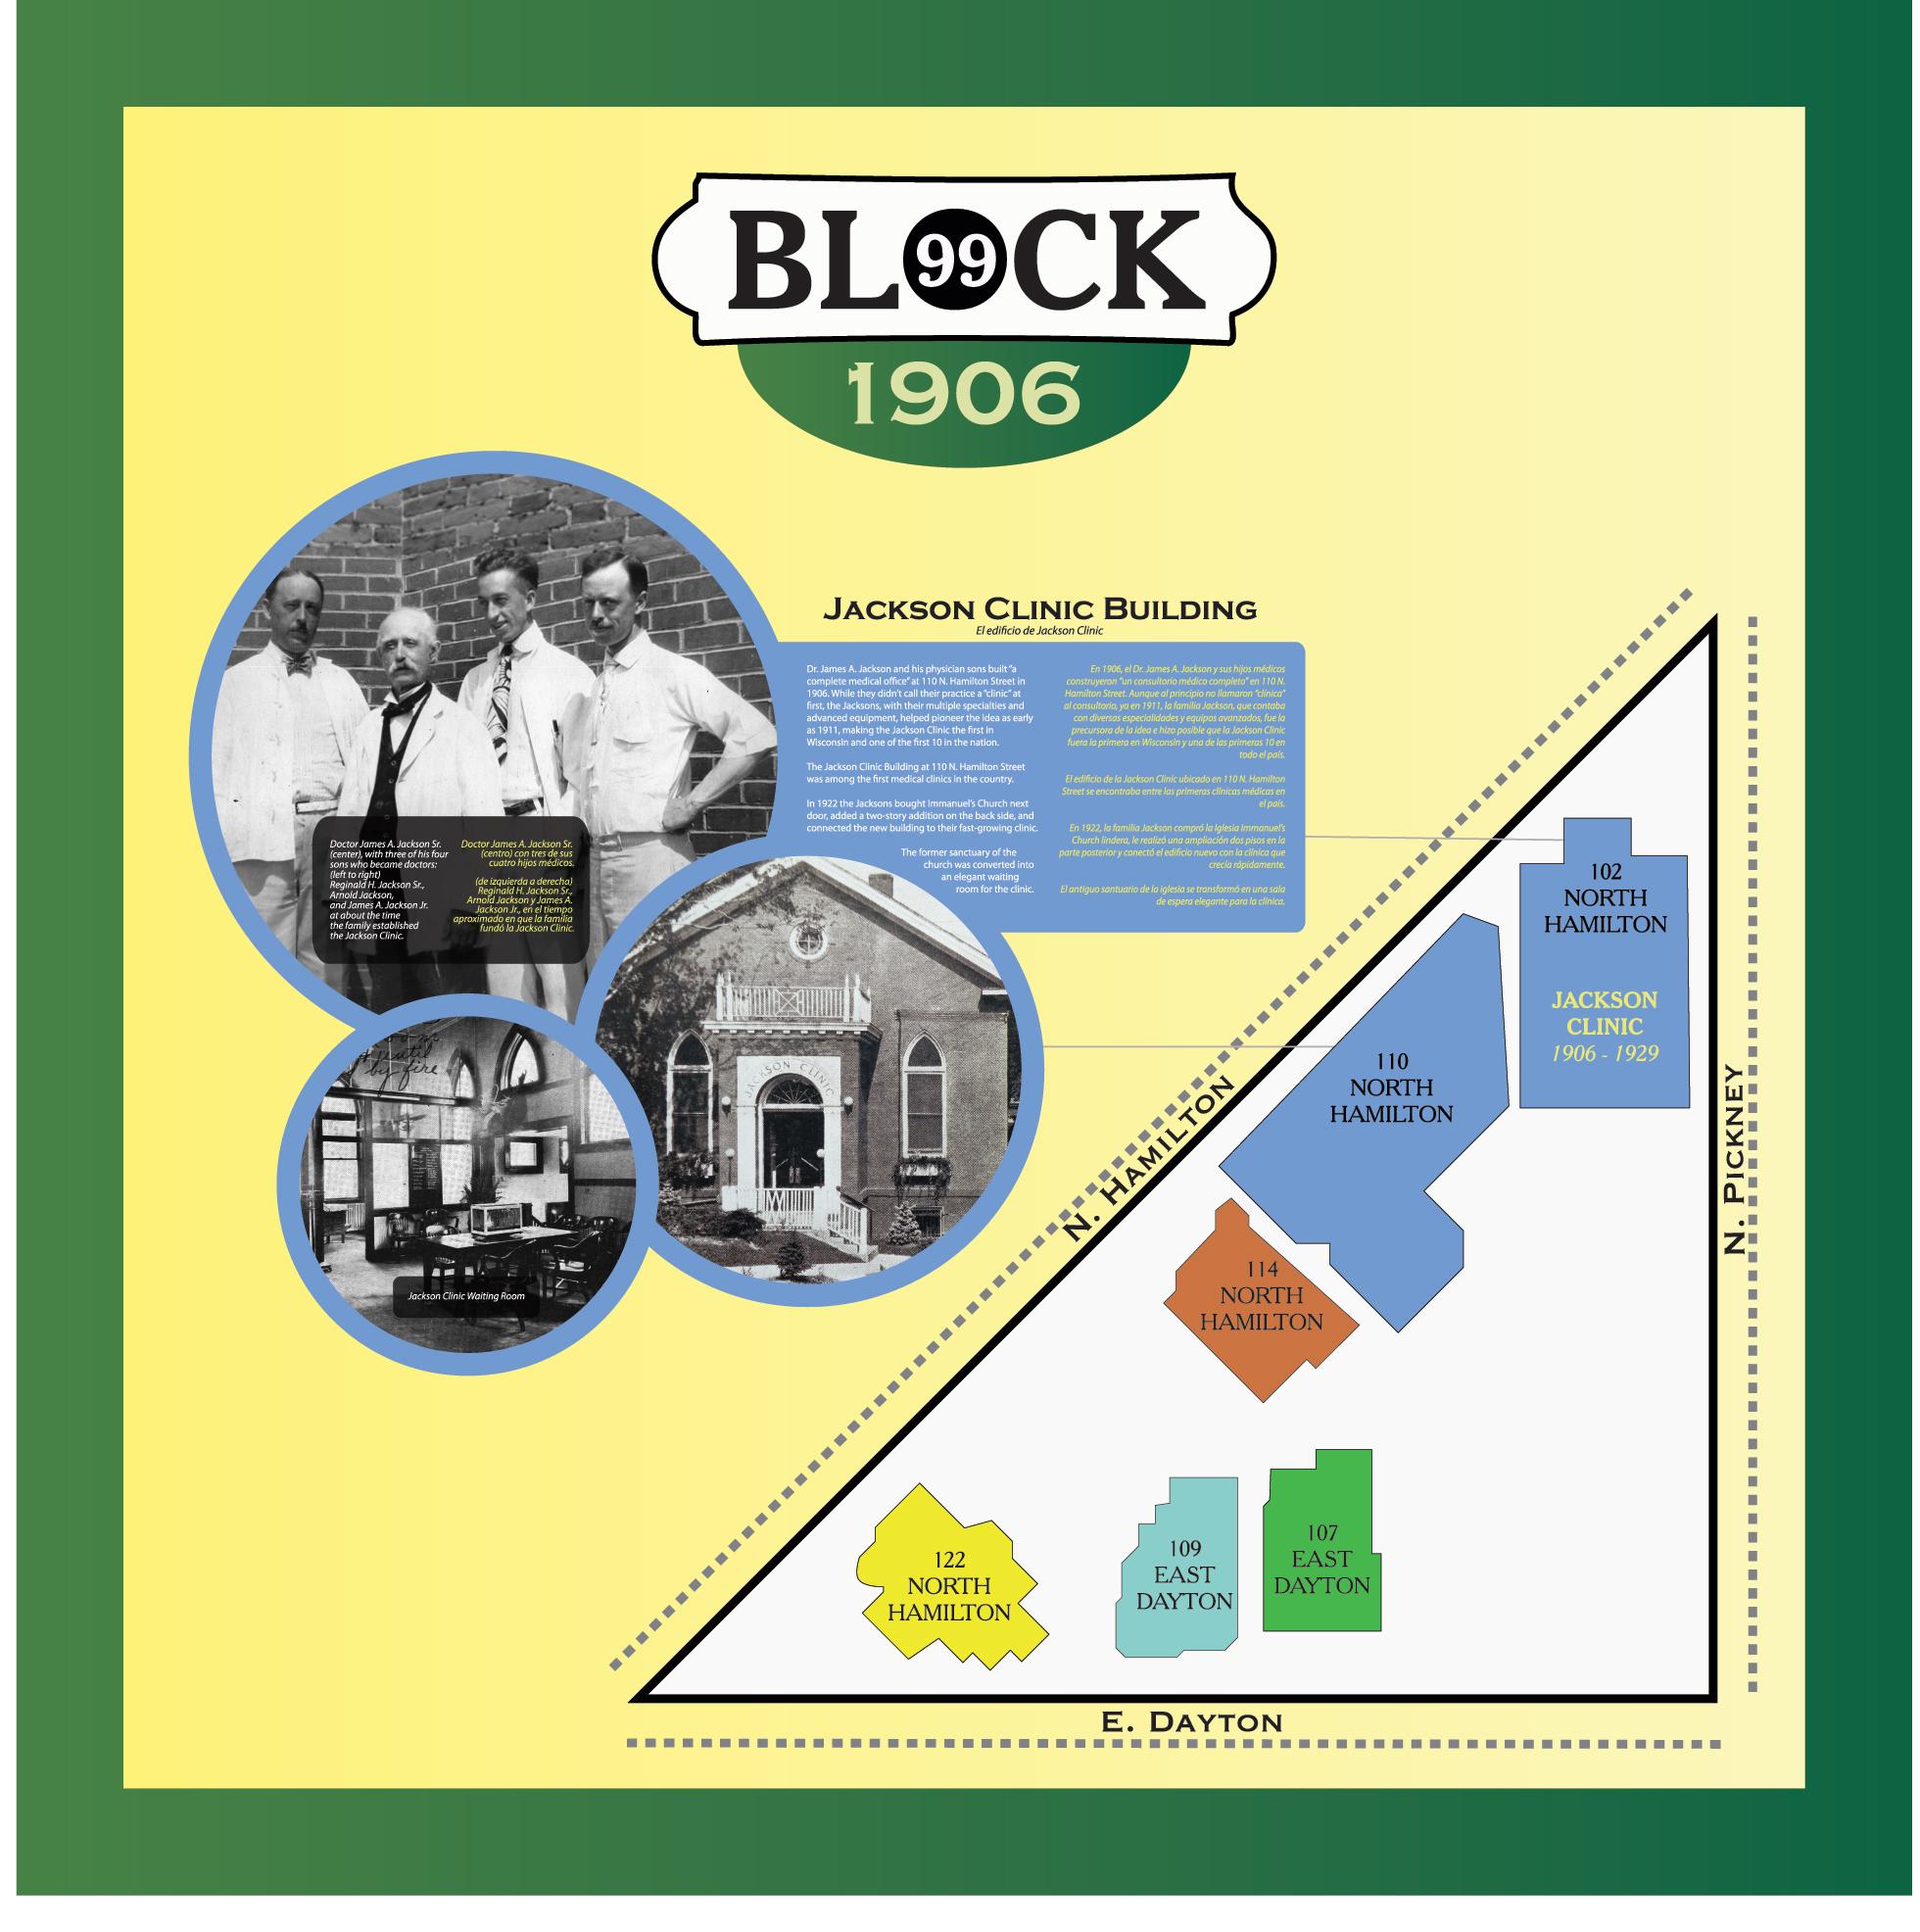 BLOCK_99_Panels_FINAL-DRAFT-UPDATE-panel3.jpg